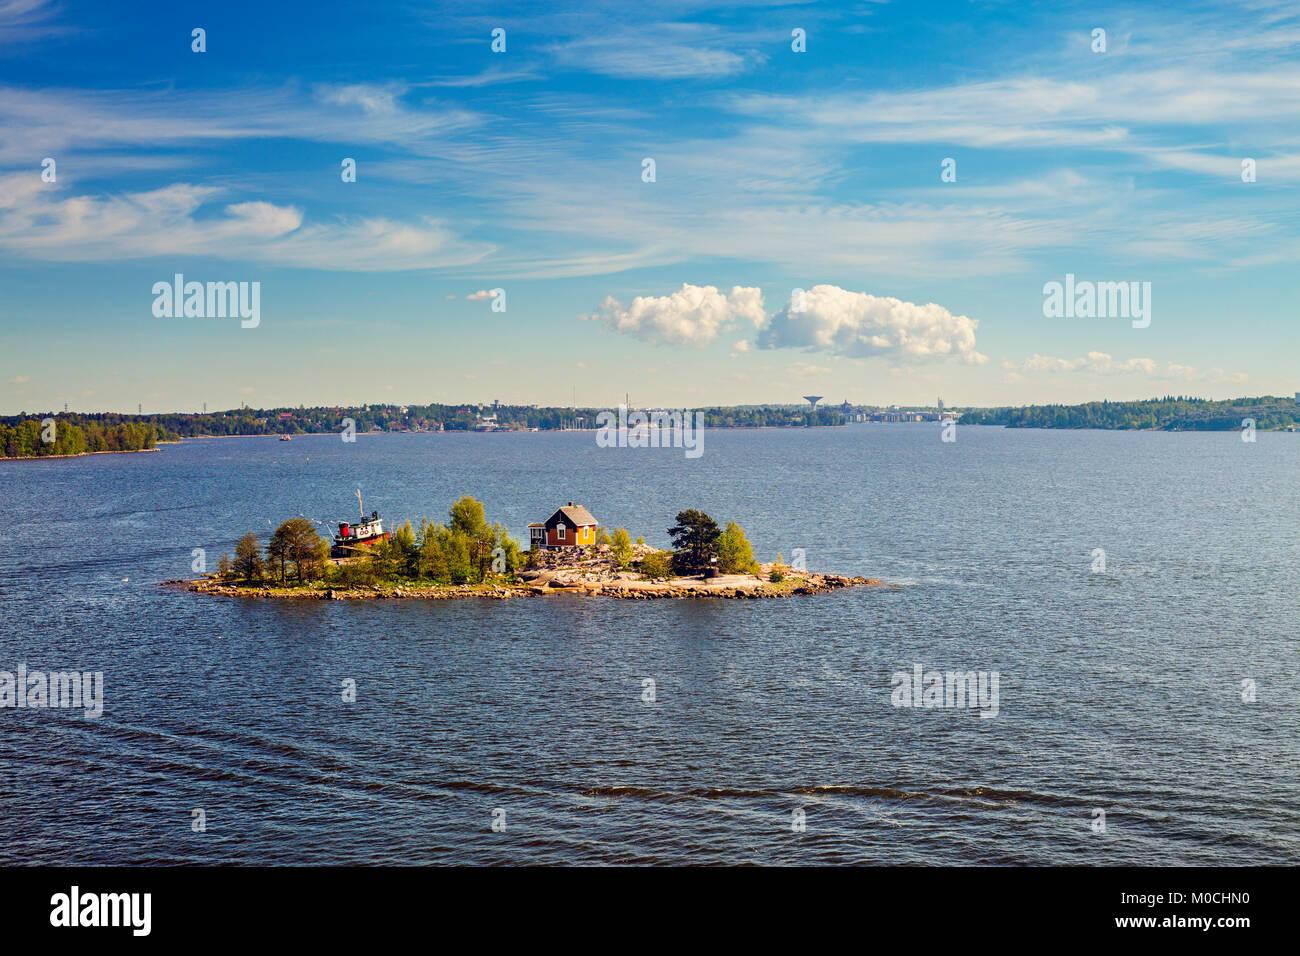 An island in the sea near Helsinki, Finland. Stock Photo